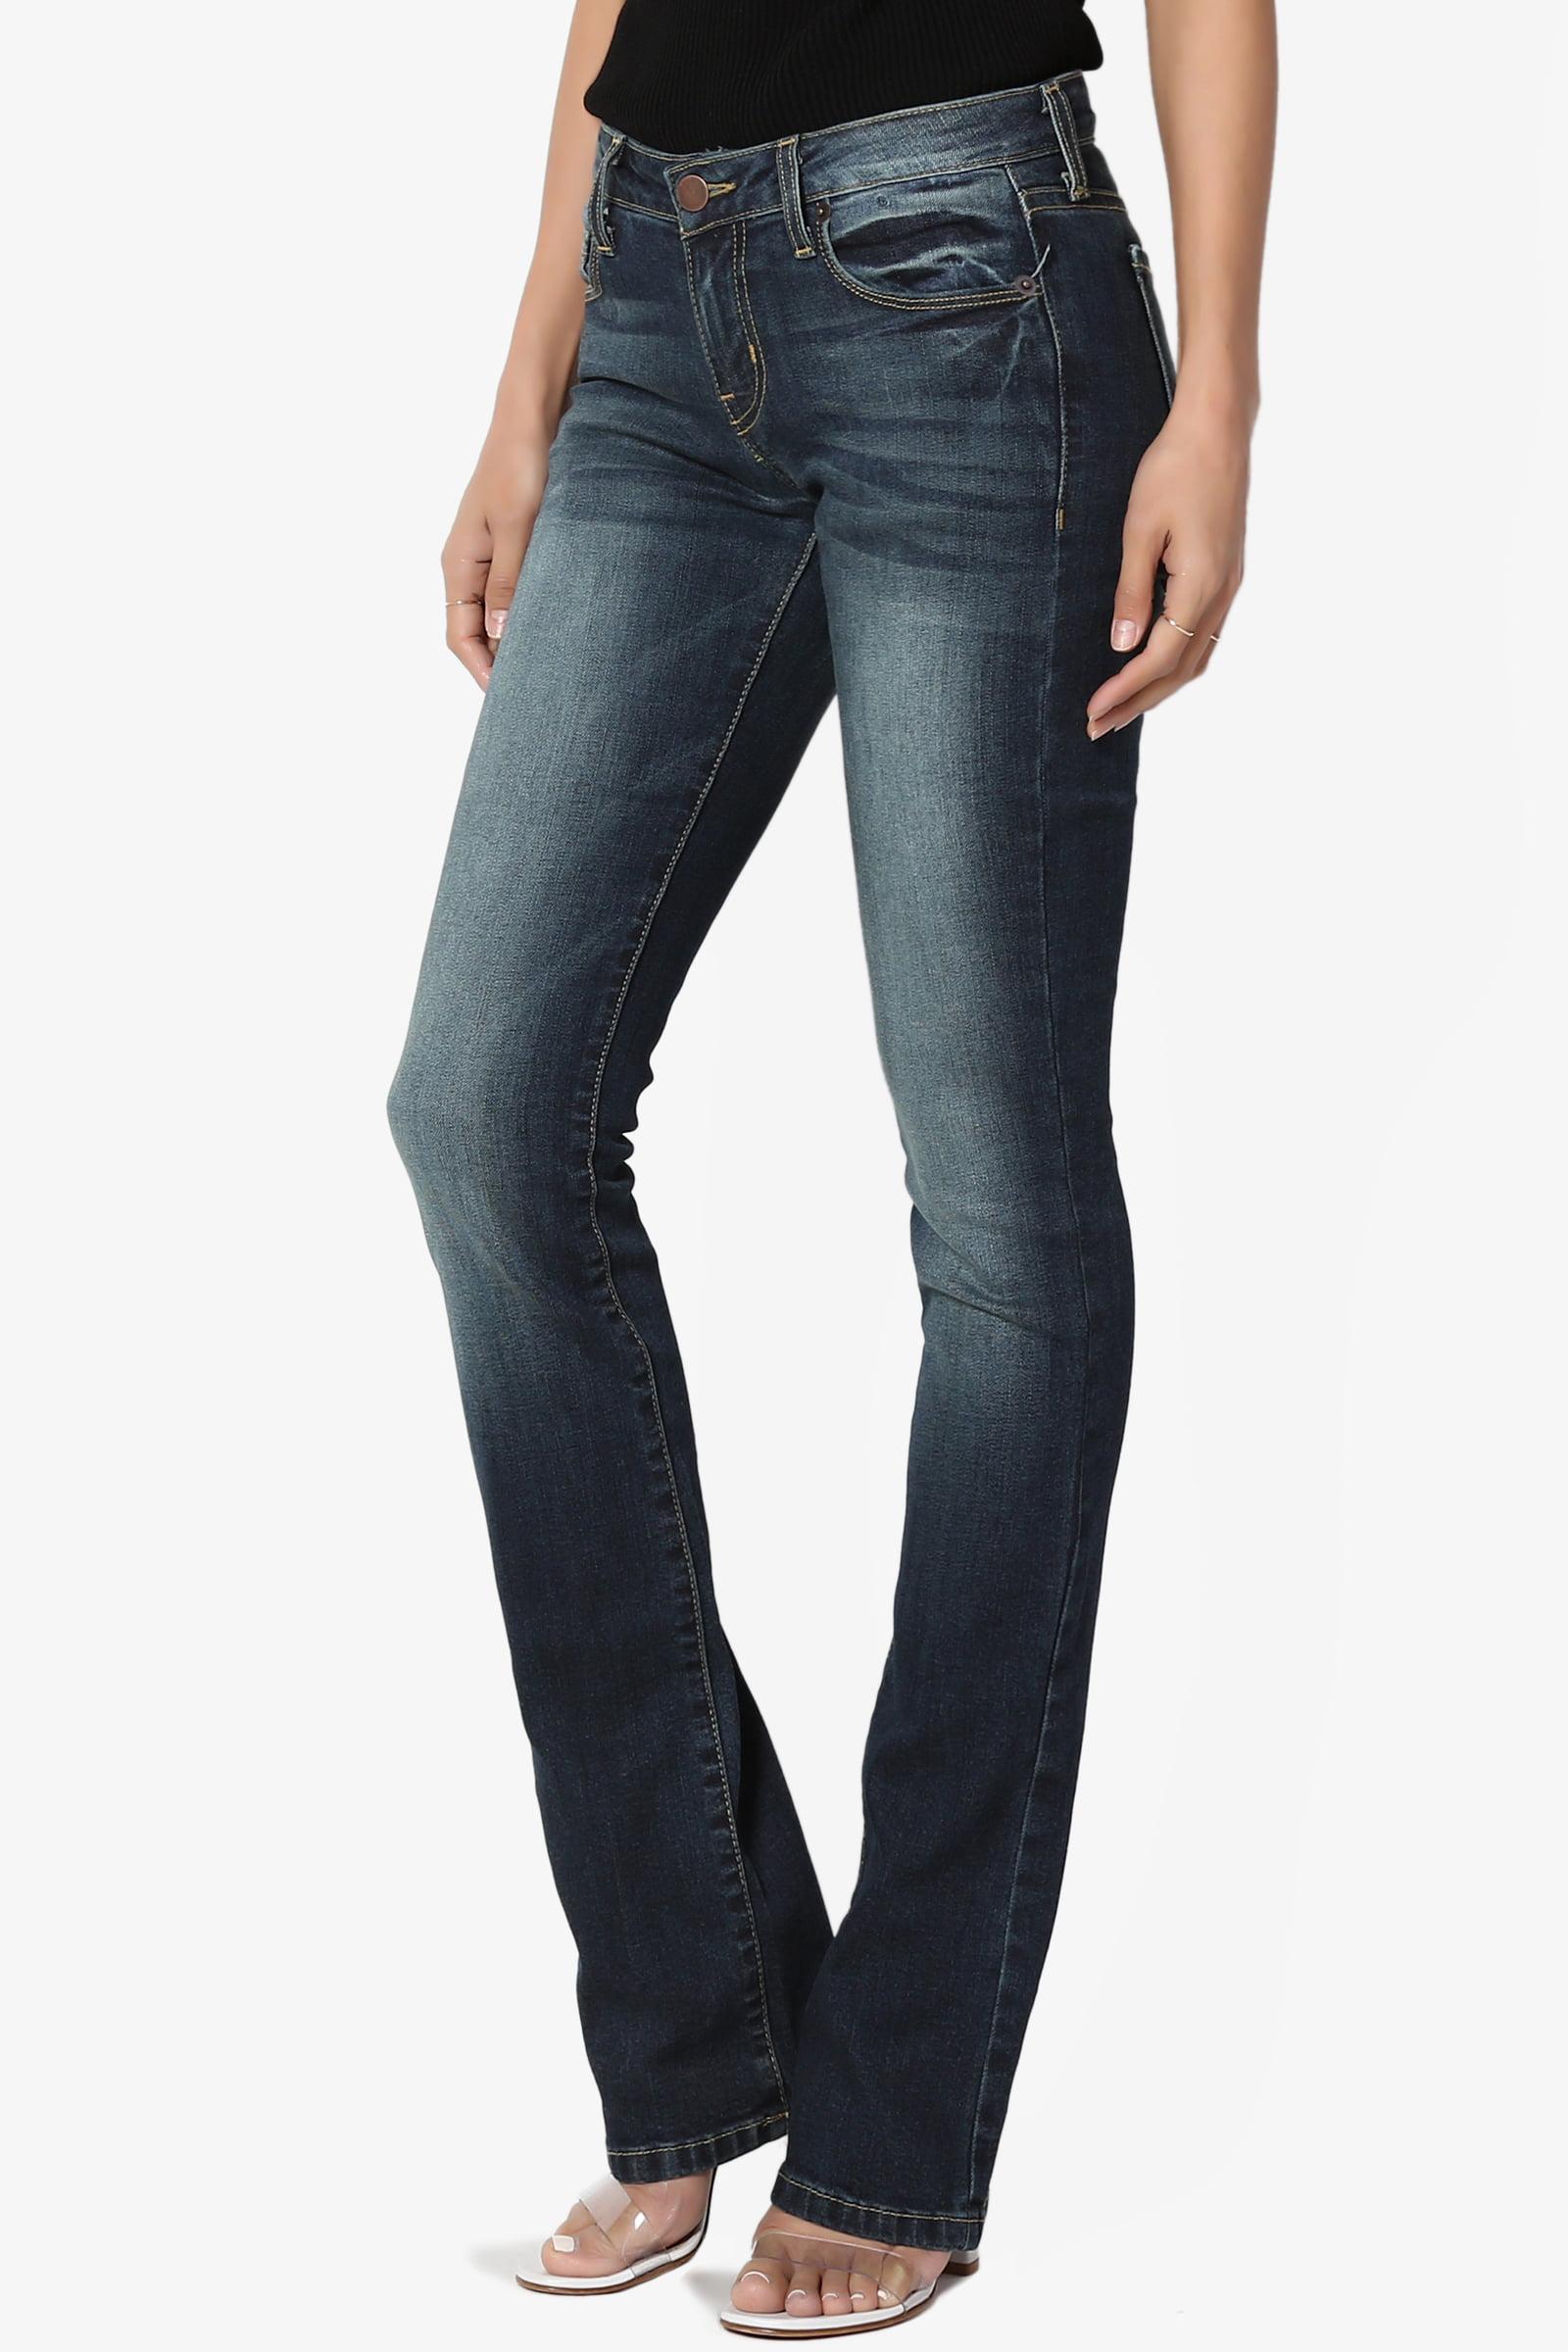 TheMogan Vintage Versatile Washed Stretch Denim Mid Rise Slim Boot Cut Jeans